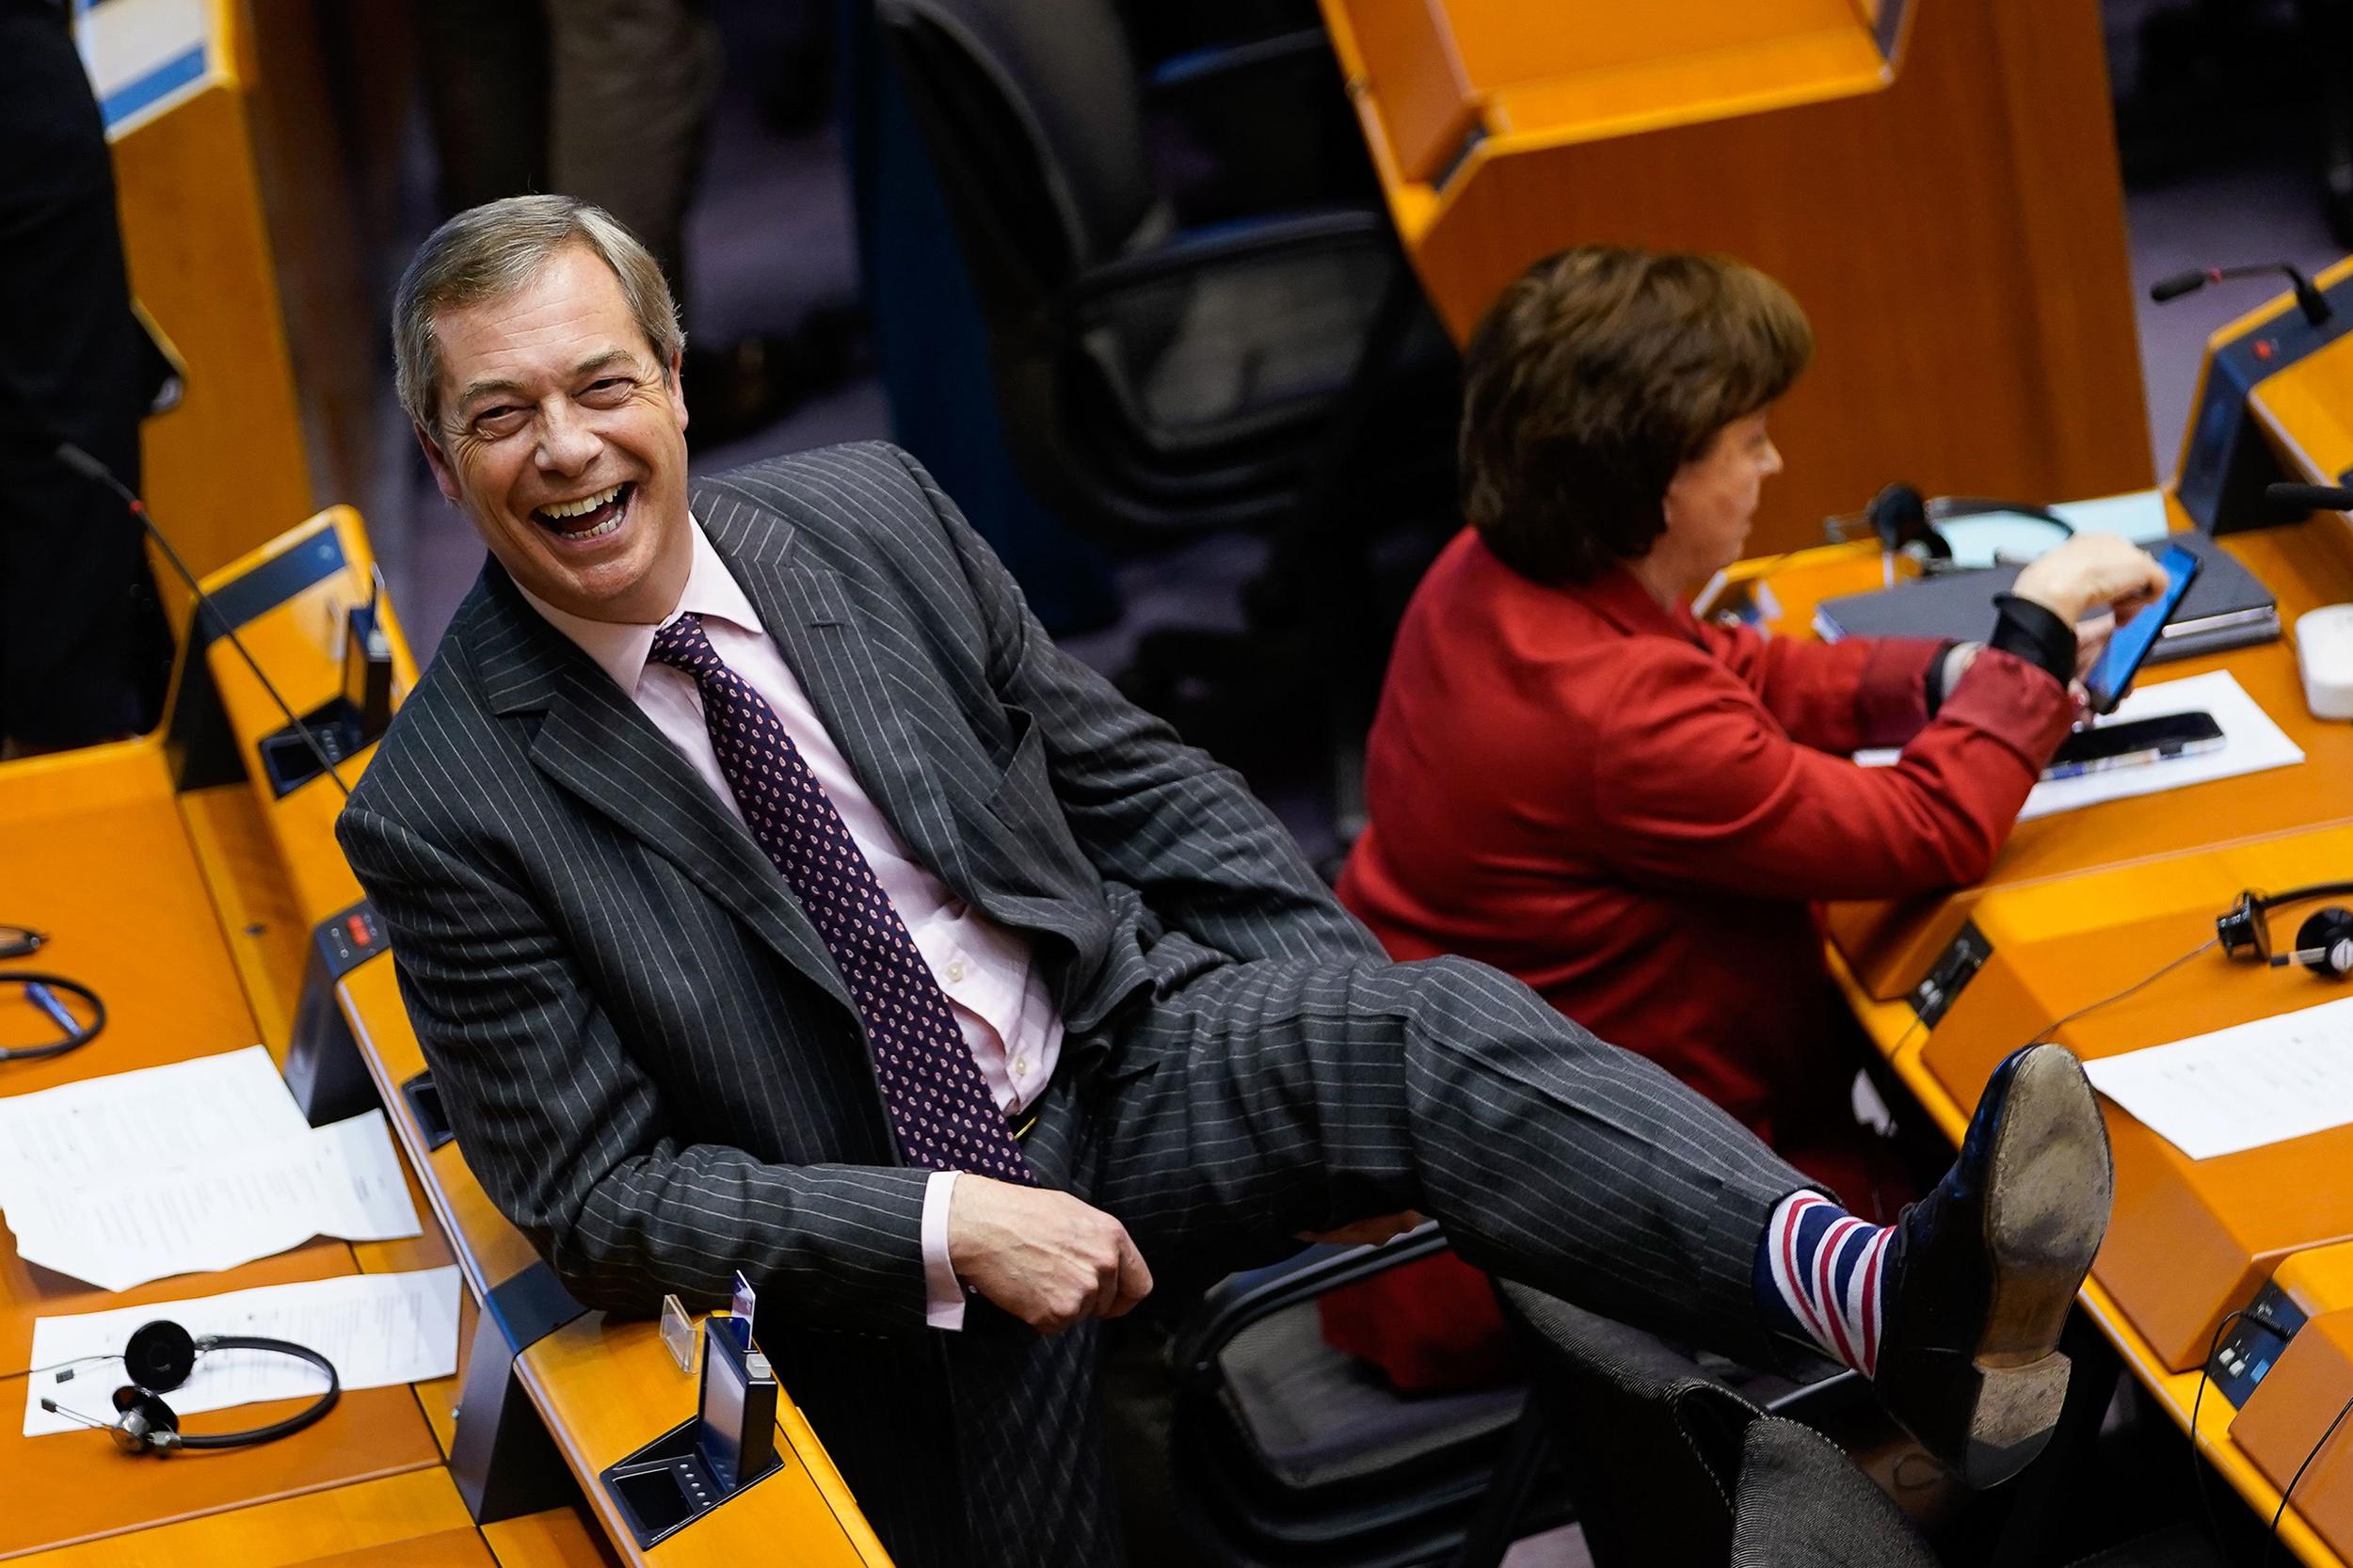 Image: Britain's Brexit Party leader Nigel Farage